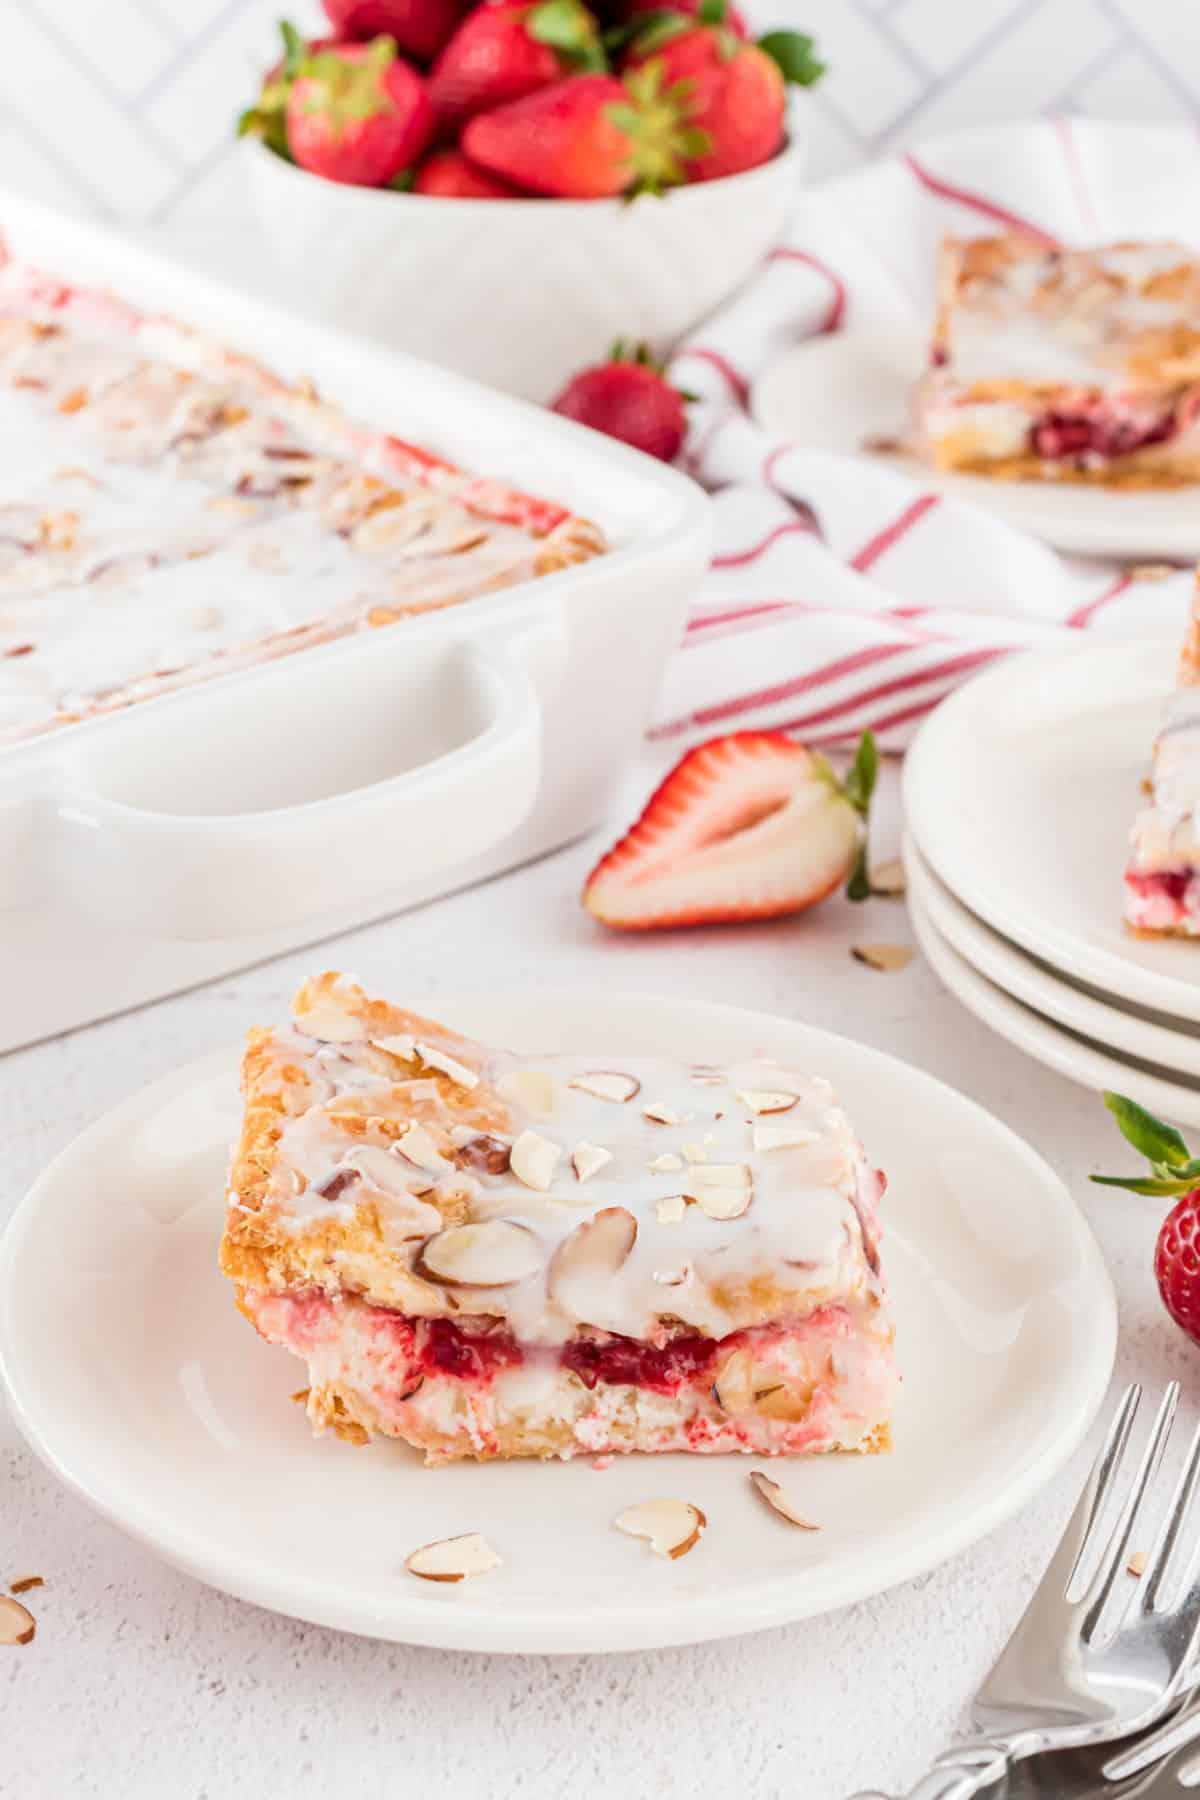 Strawberry danish slice on a white plate.